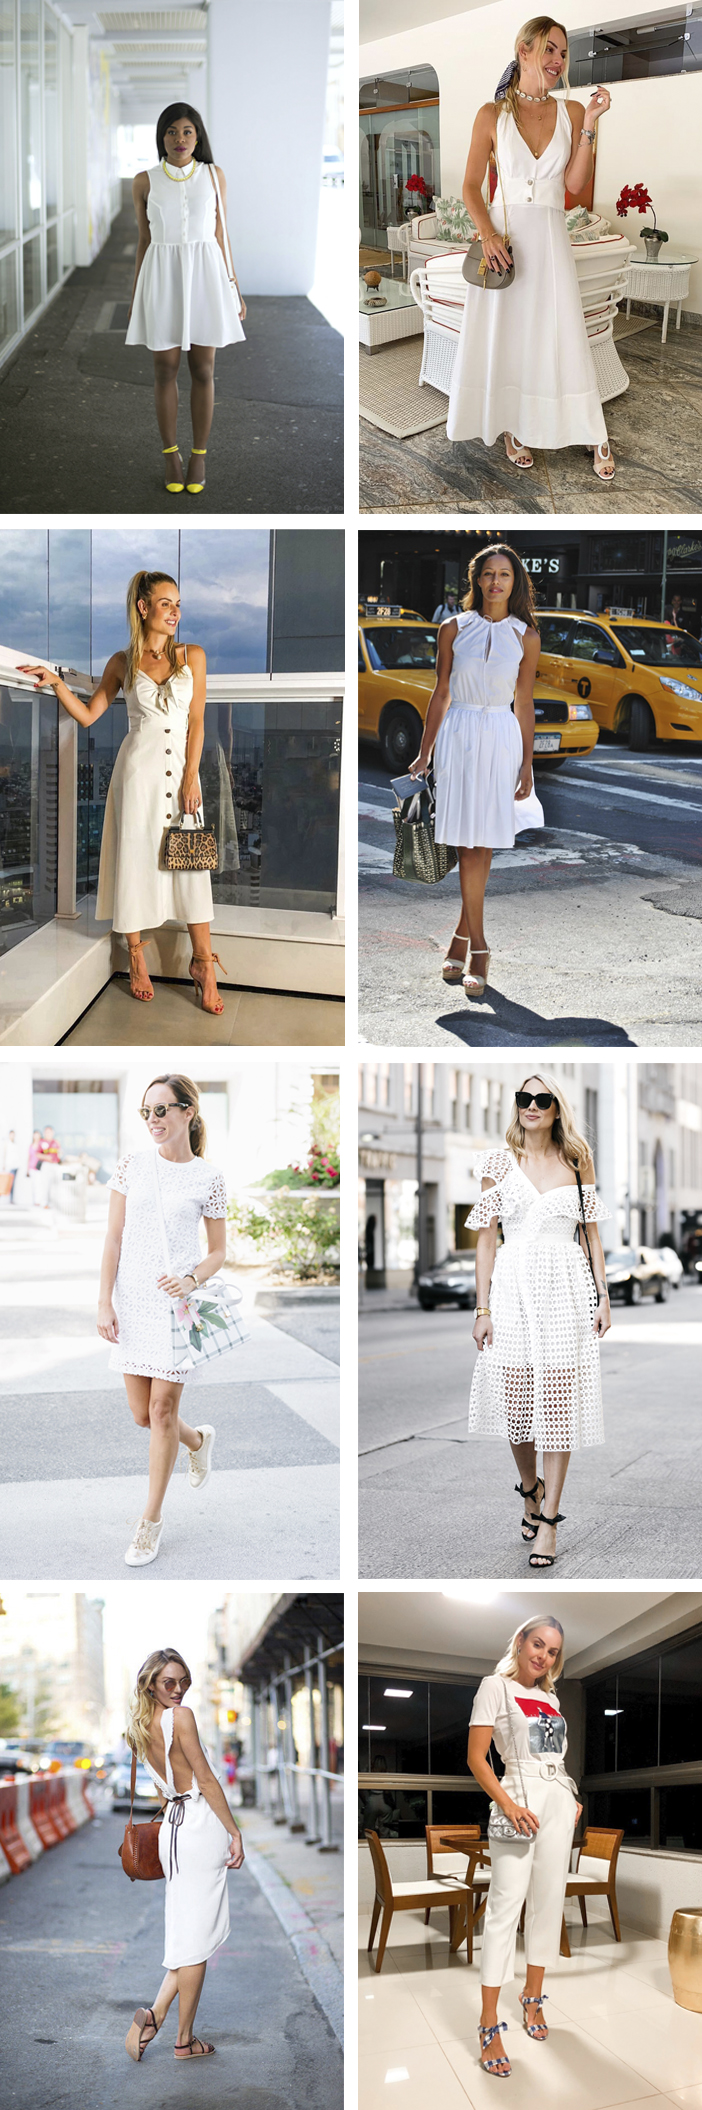 Tendência - Looks brancos para o verão